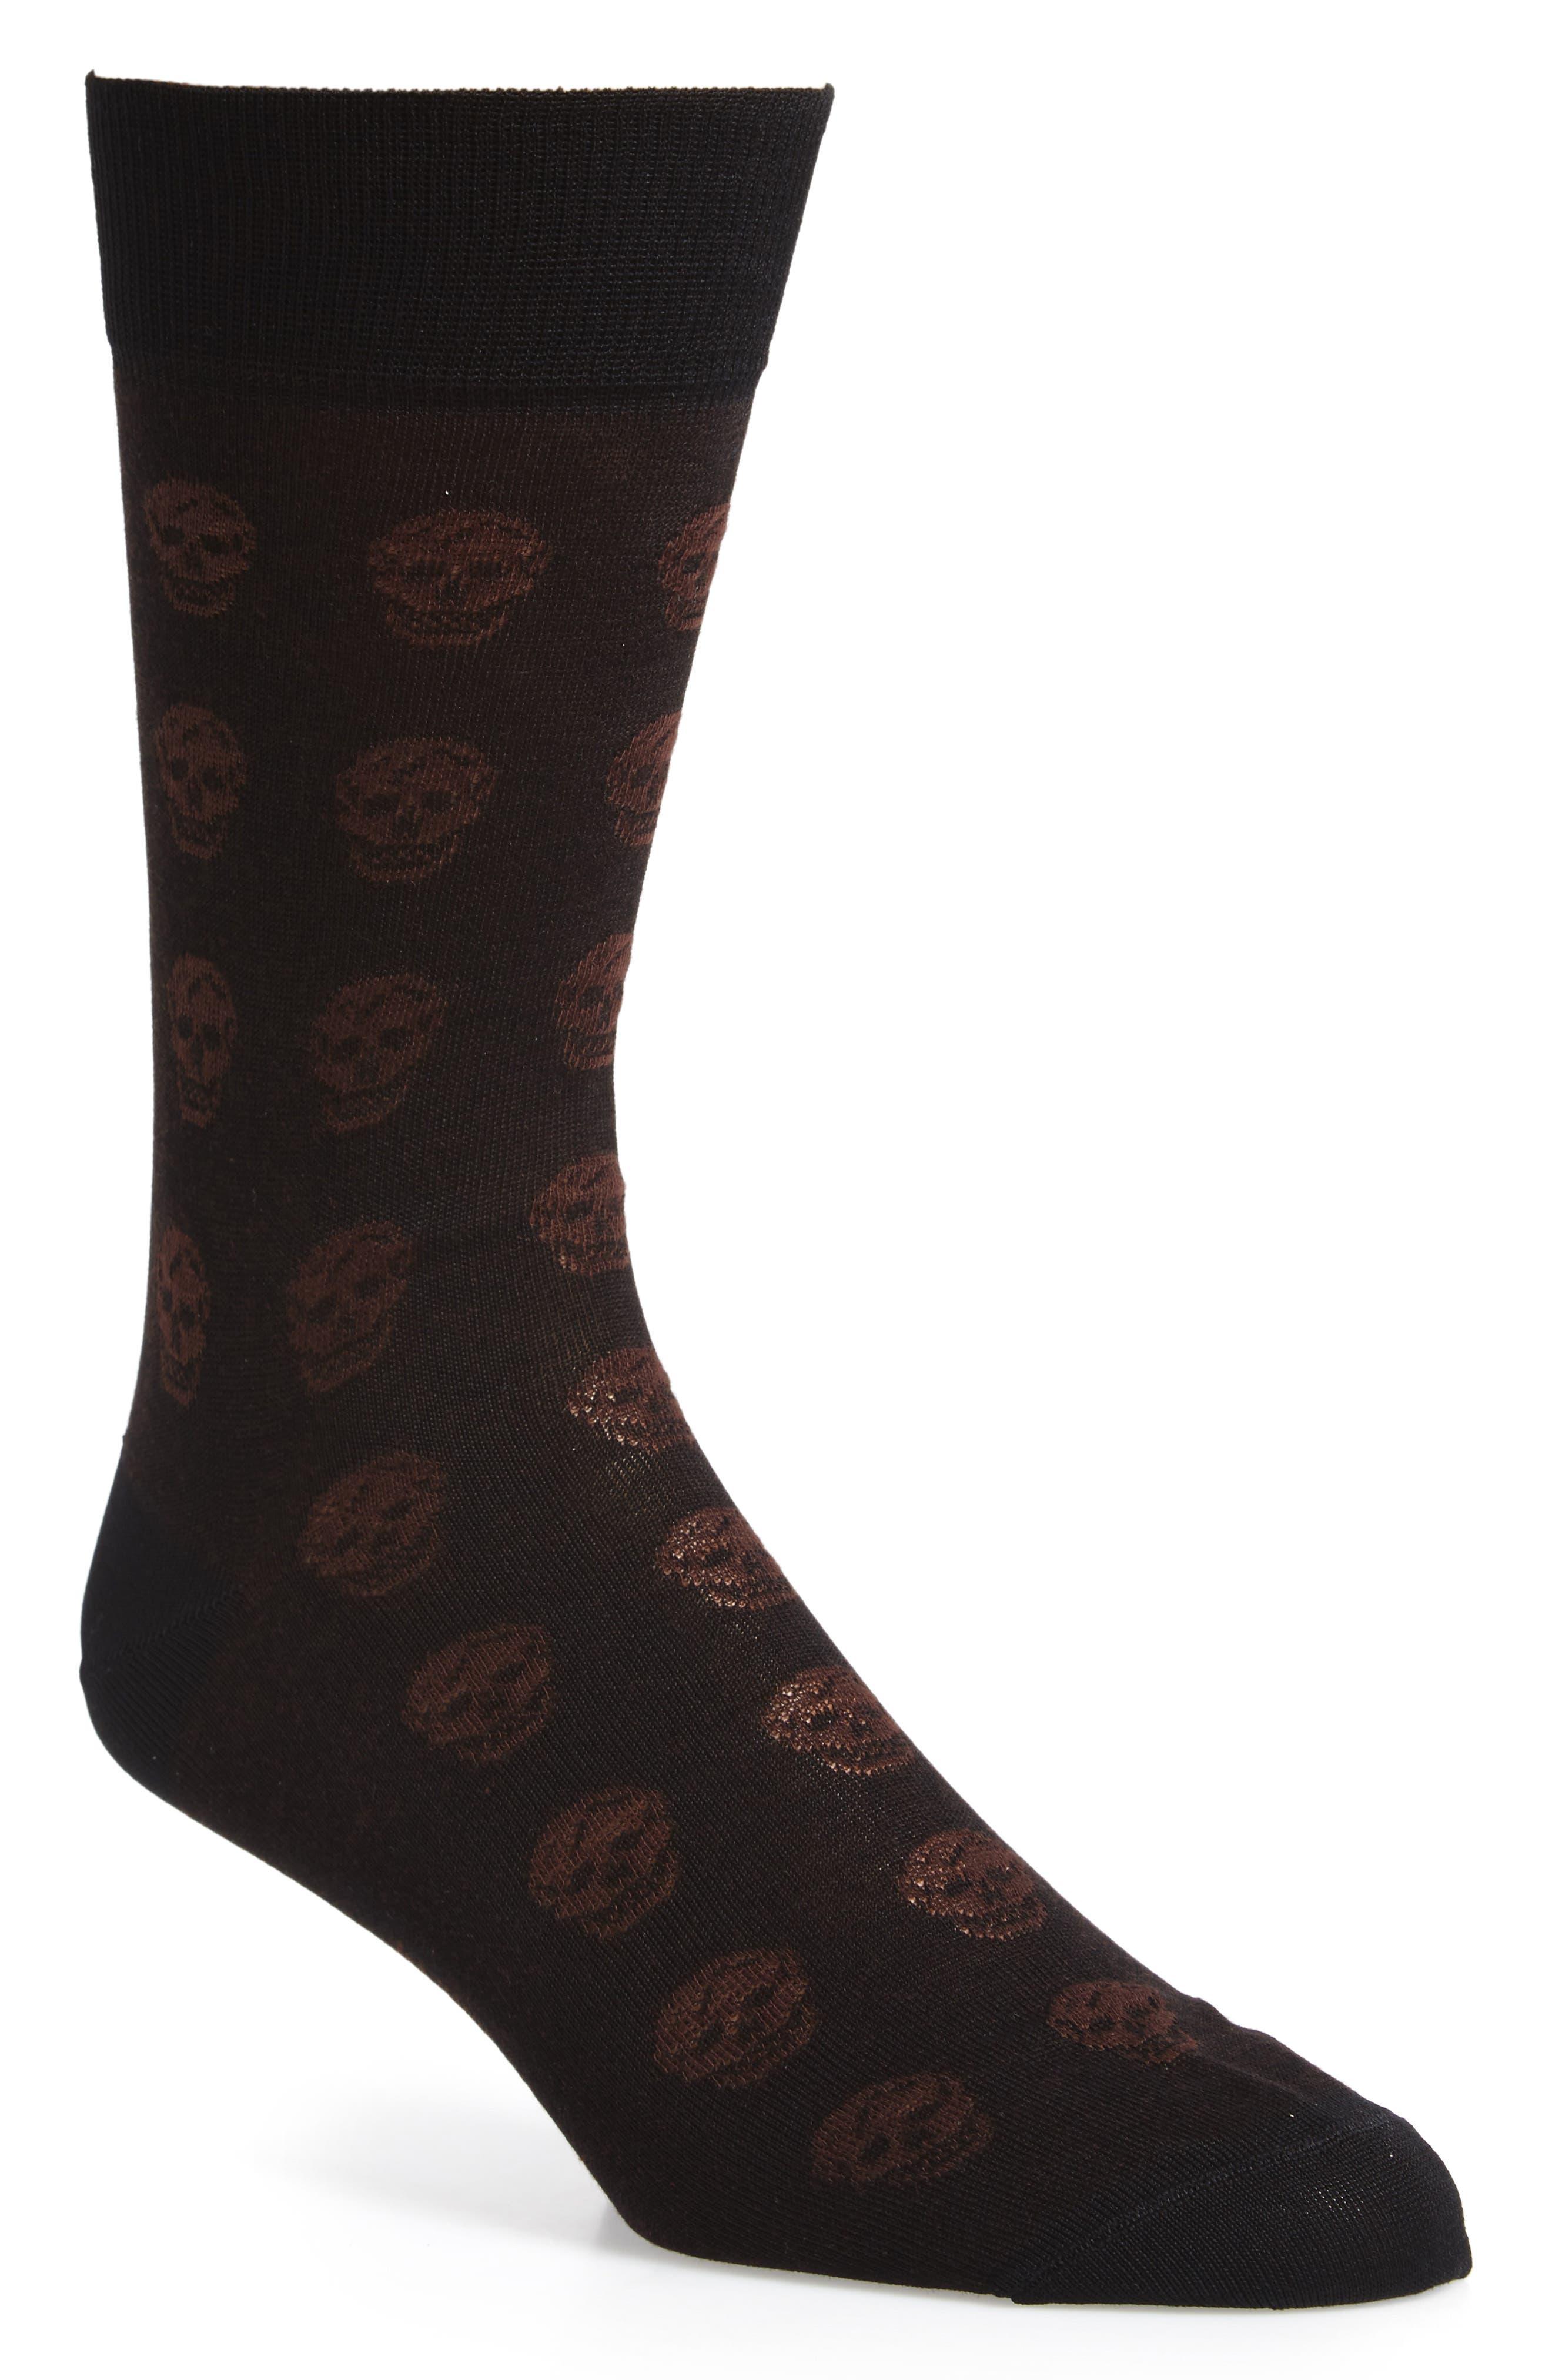 Skull Socks,                         Main,                         color, 011